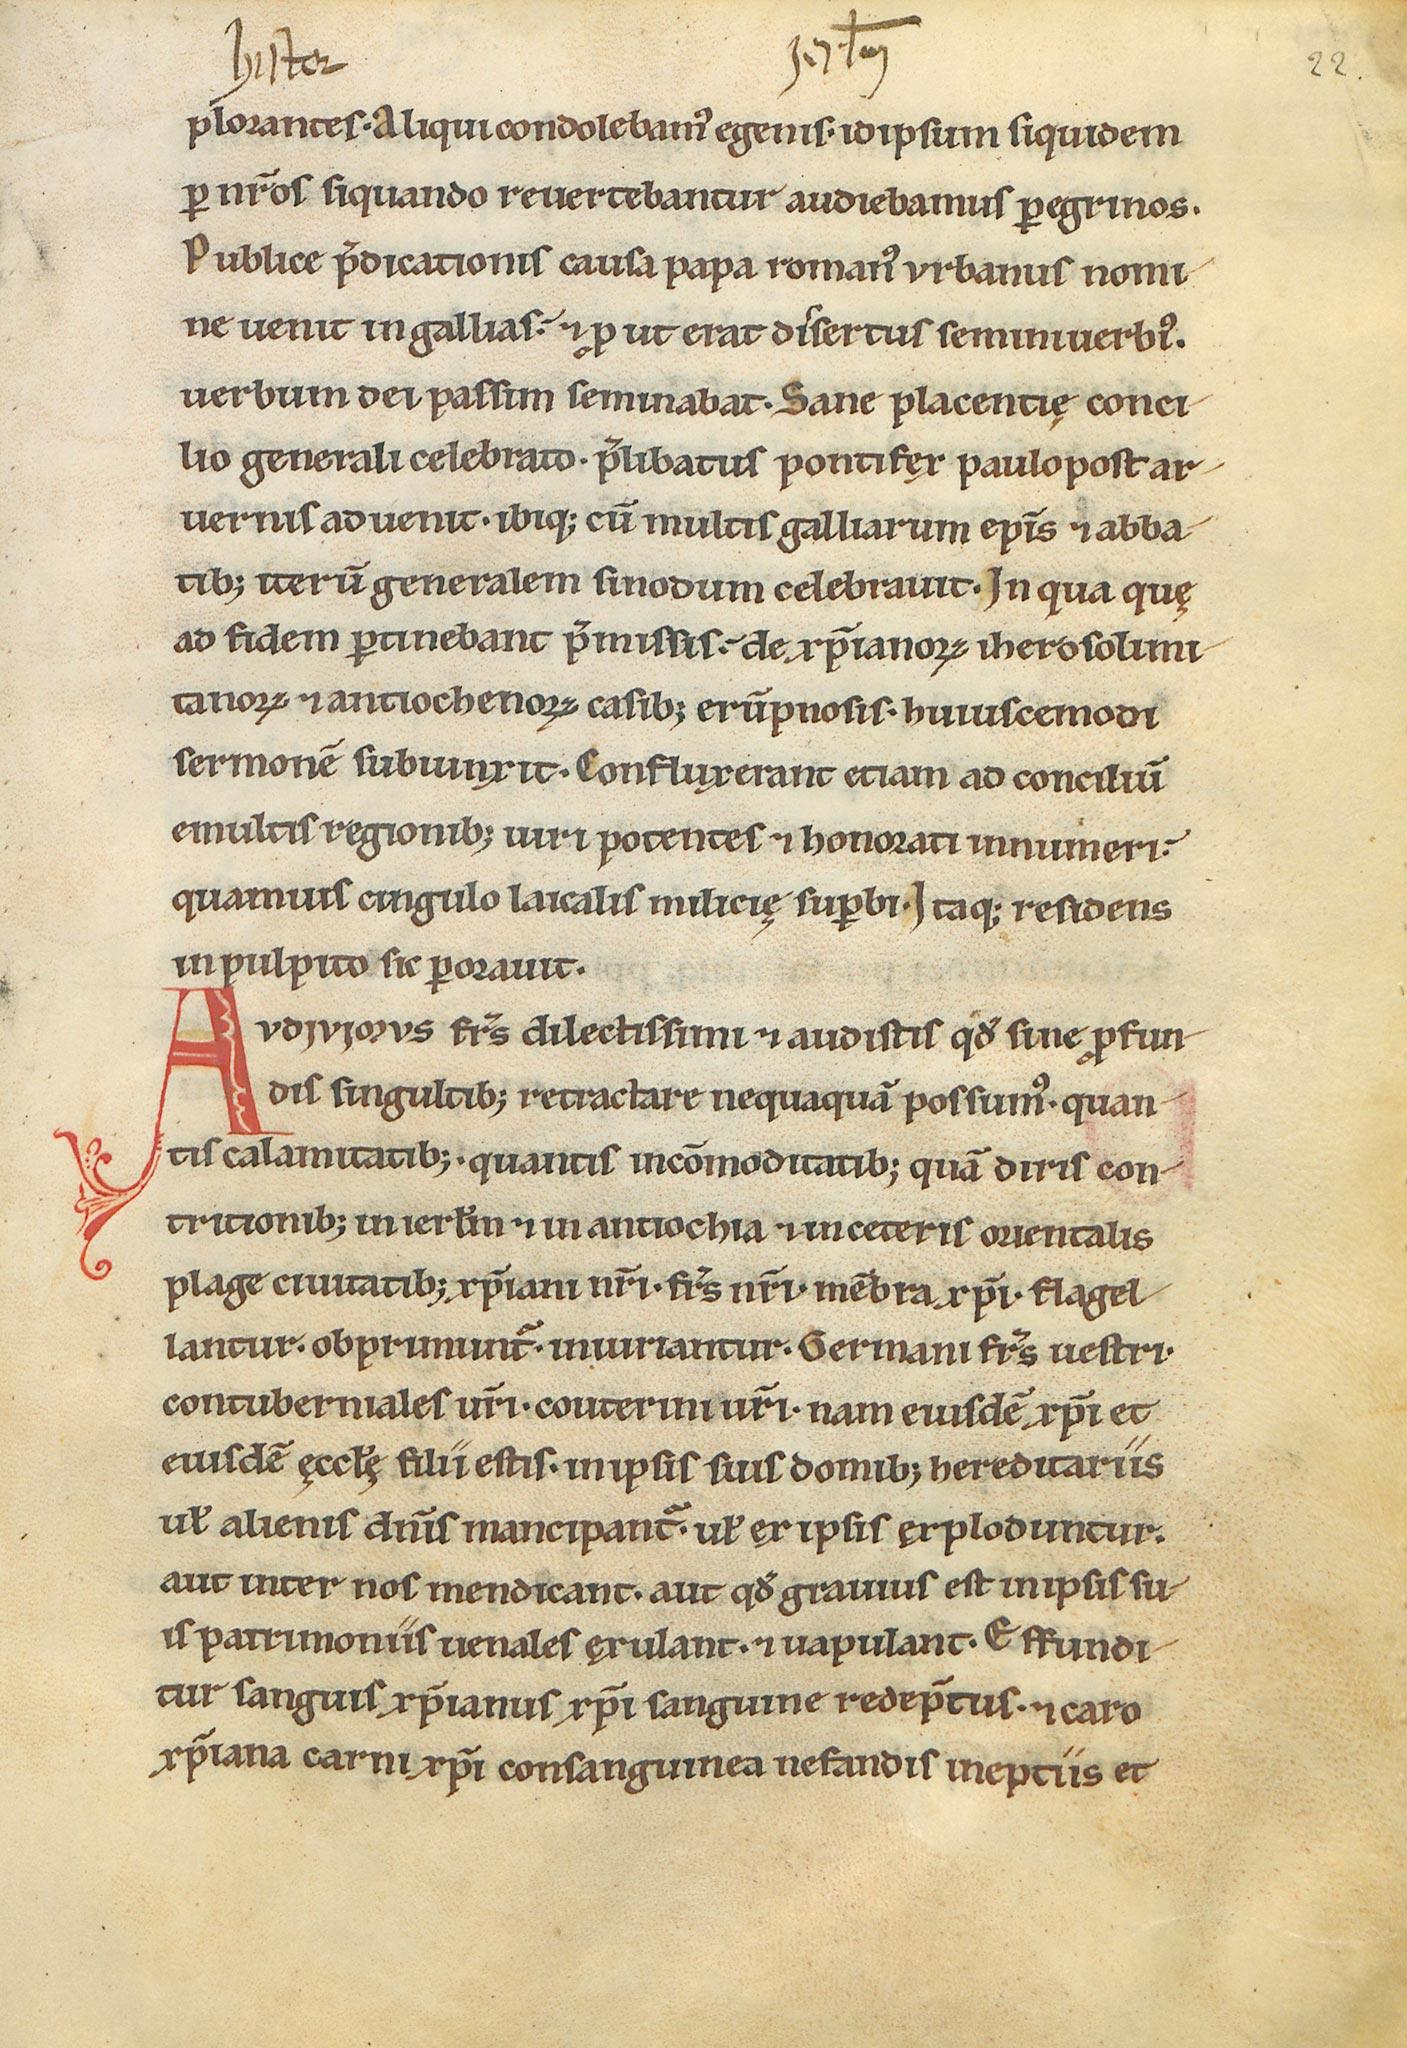 Manuscrit-Historia-Hierosolimitana-22r°